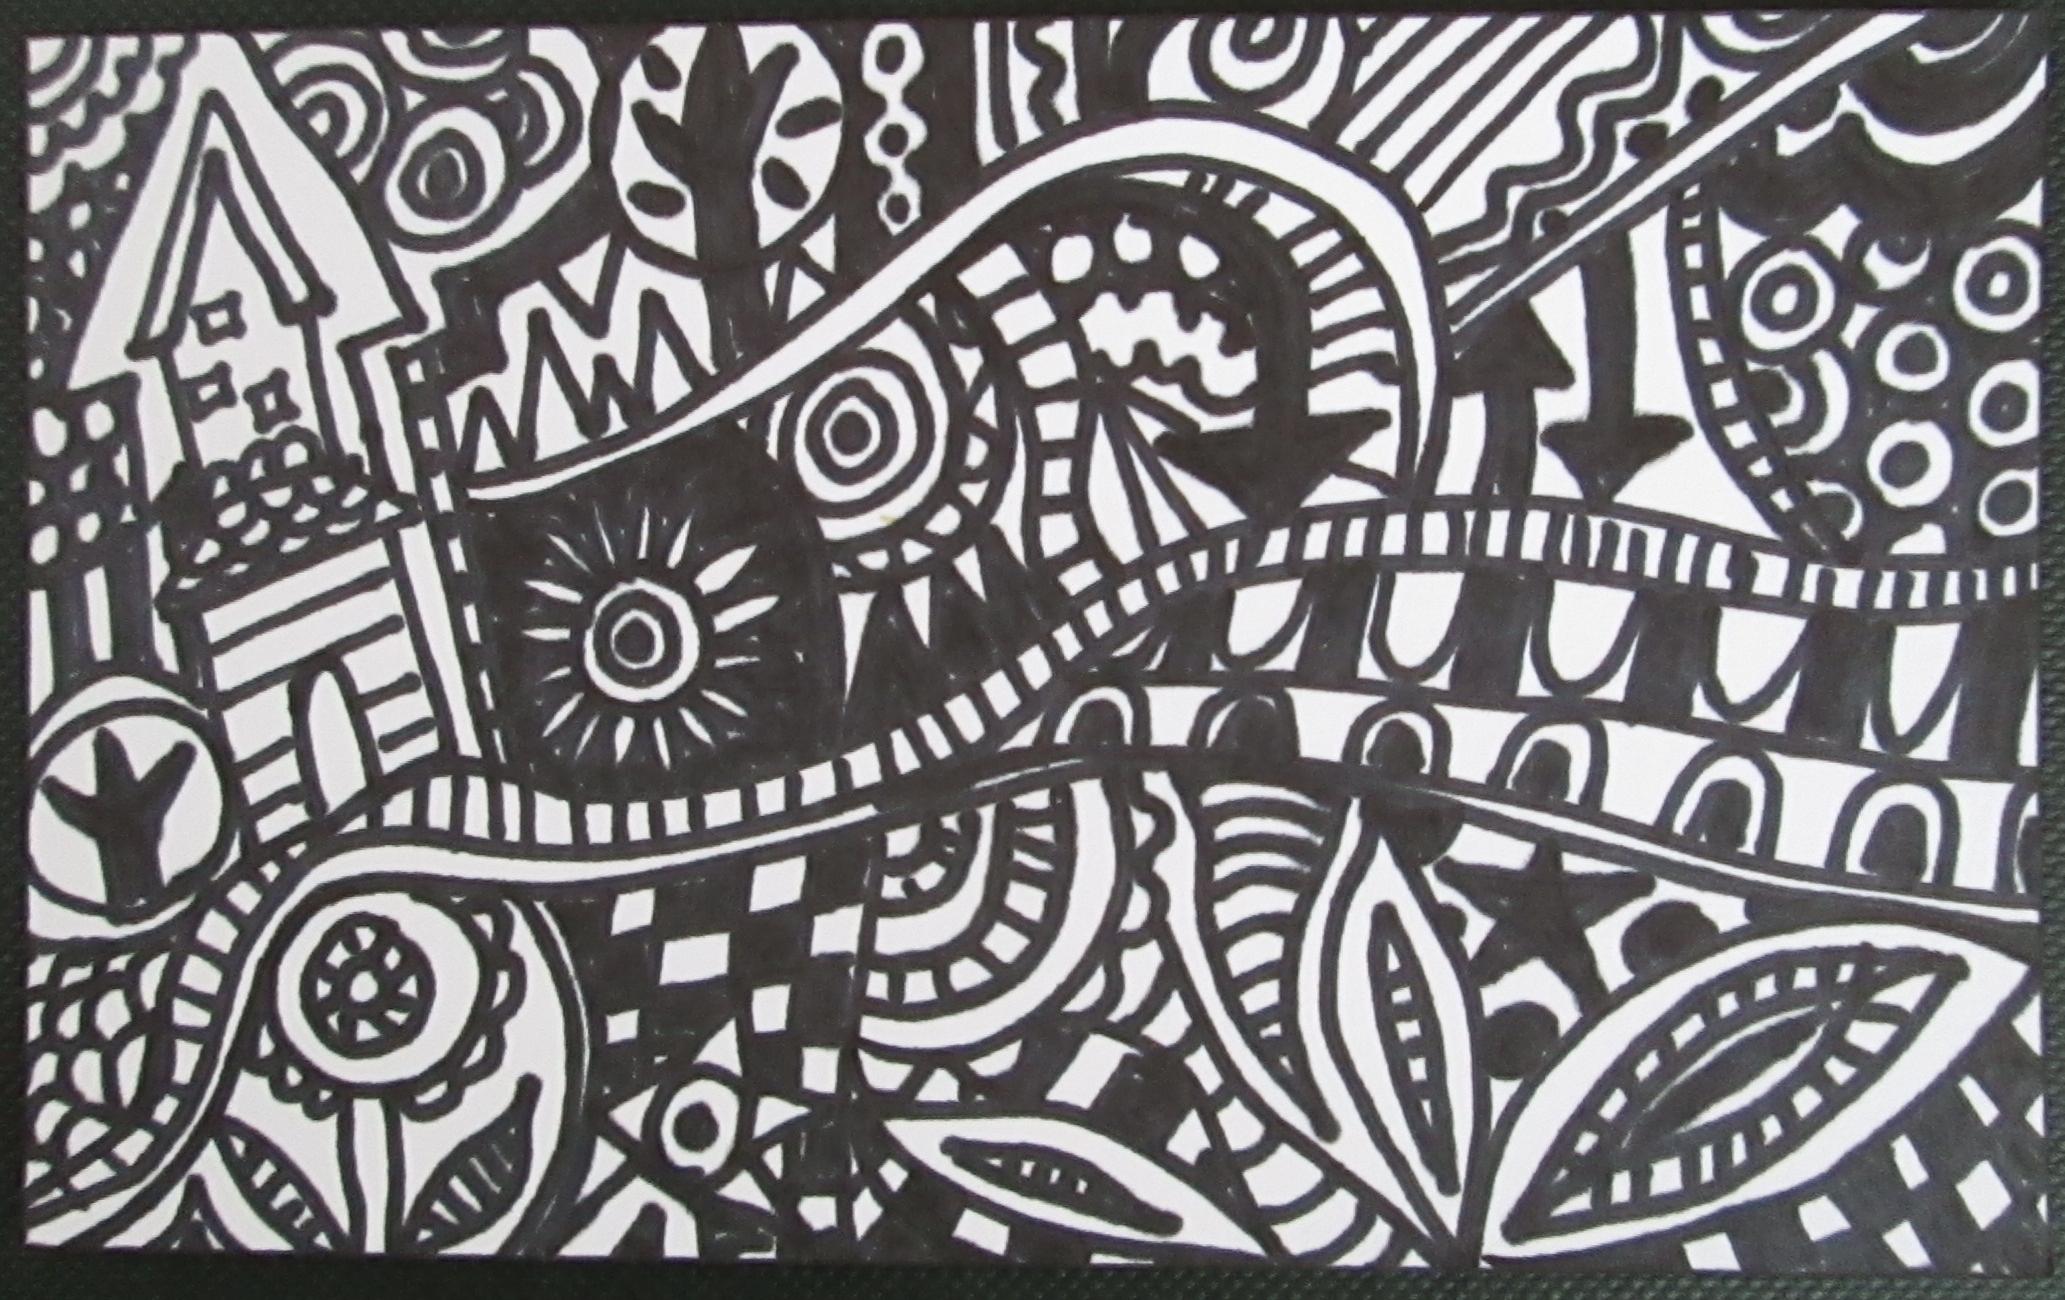 June 2013 joyful ploys for Cool designs on paper